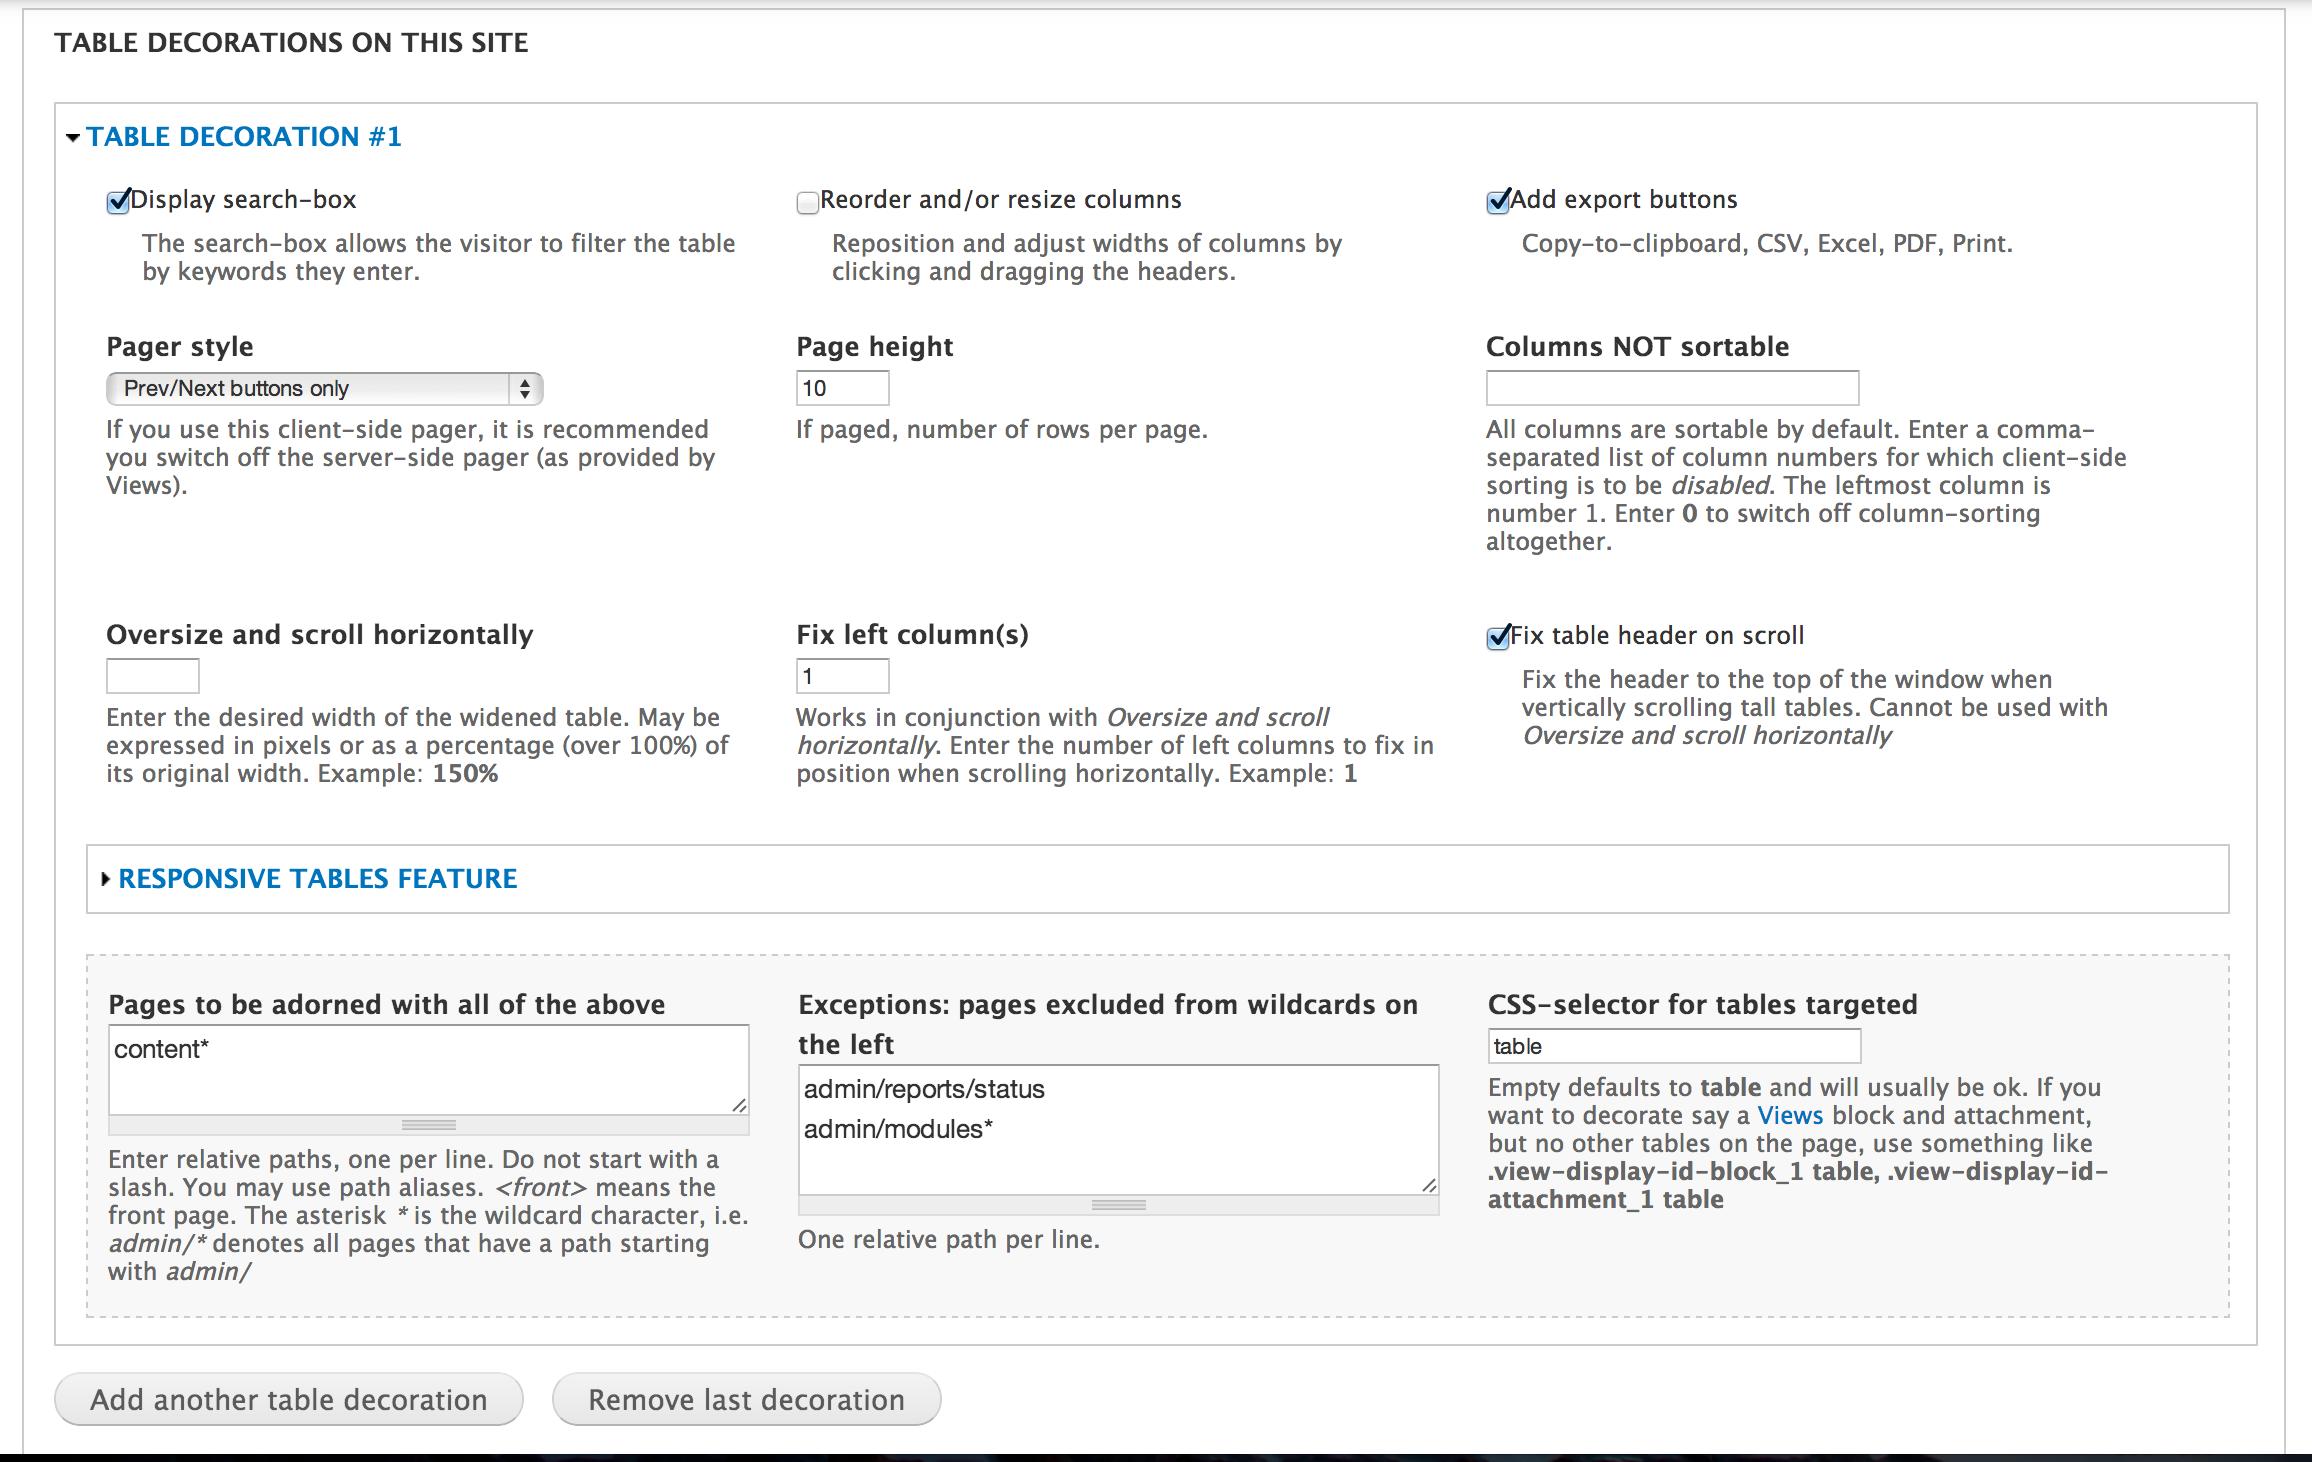 datatables 1.9.4 documentation